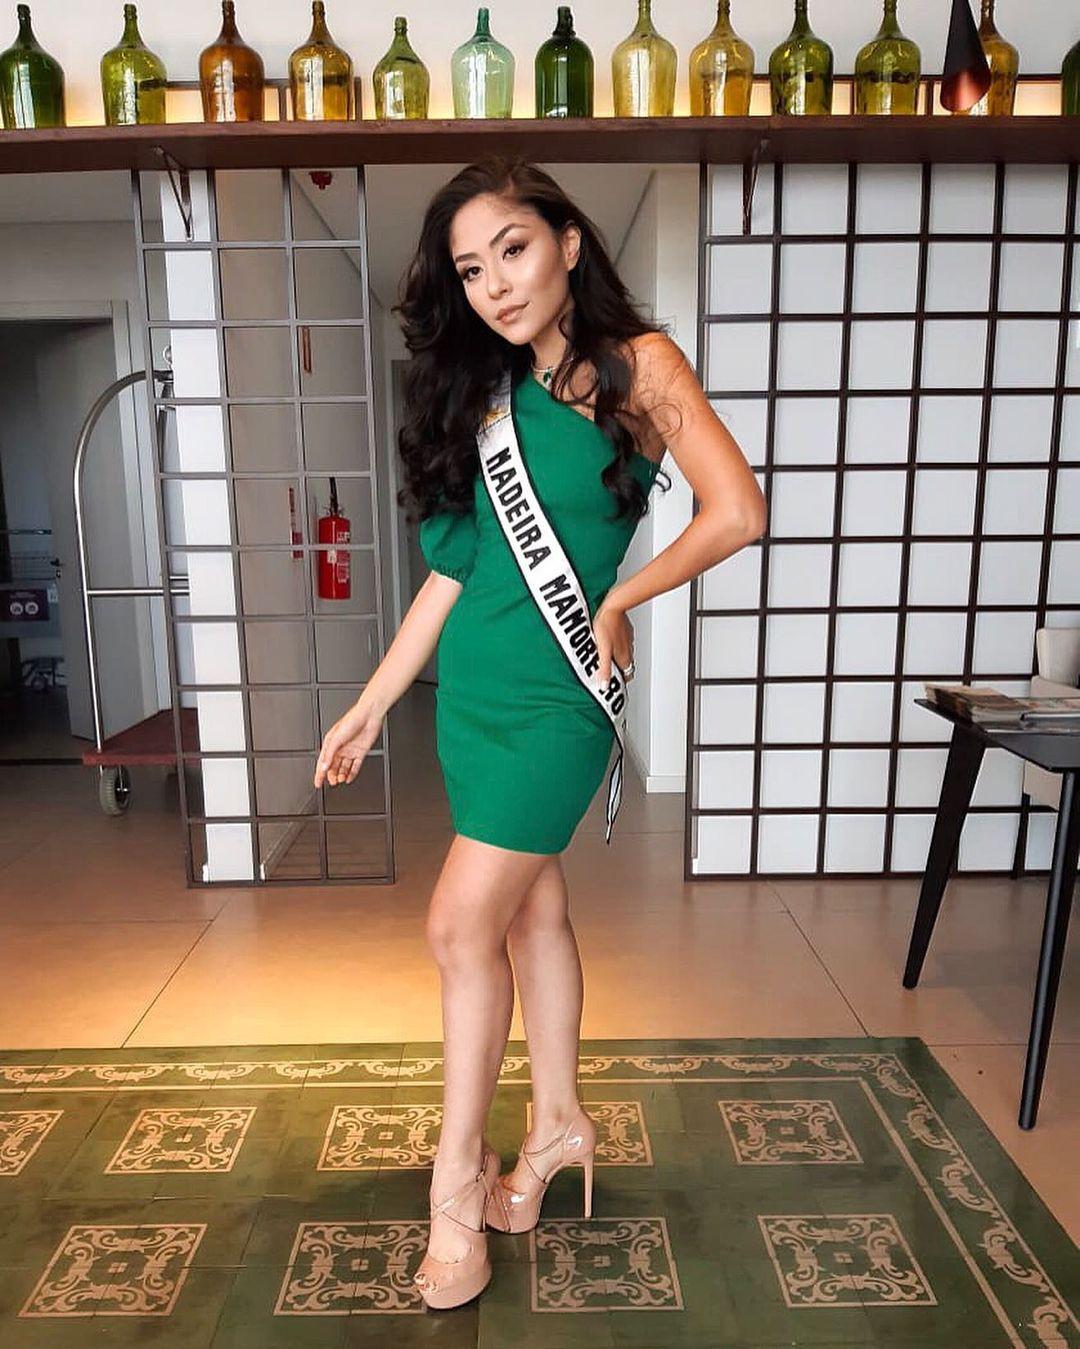 thaisi dias, miss madeira mamore mundo 2019. - Página 4 Qi64ft10